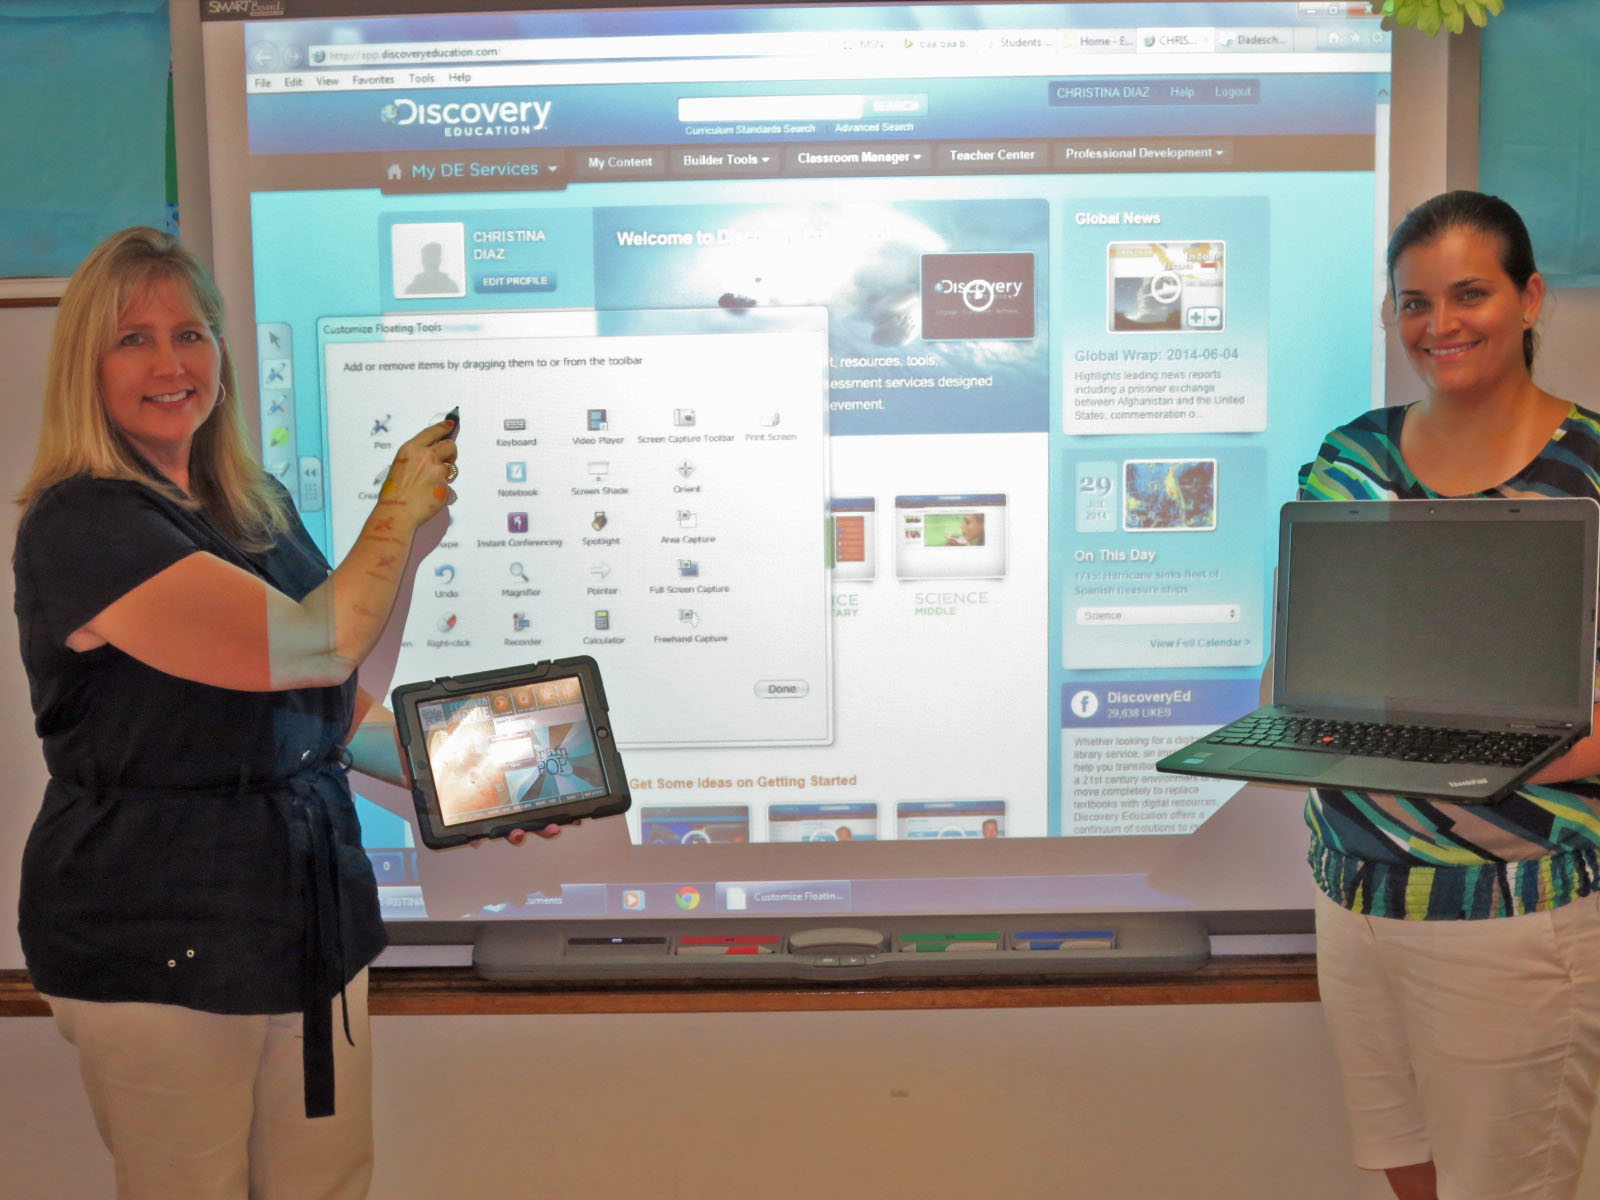 Howard Drive Principal Deanna Dalby & Asst. Principal Christina V. Diaz show off smartboard, iPad and laptop tech